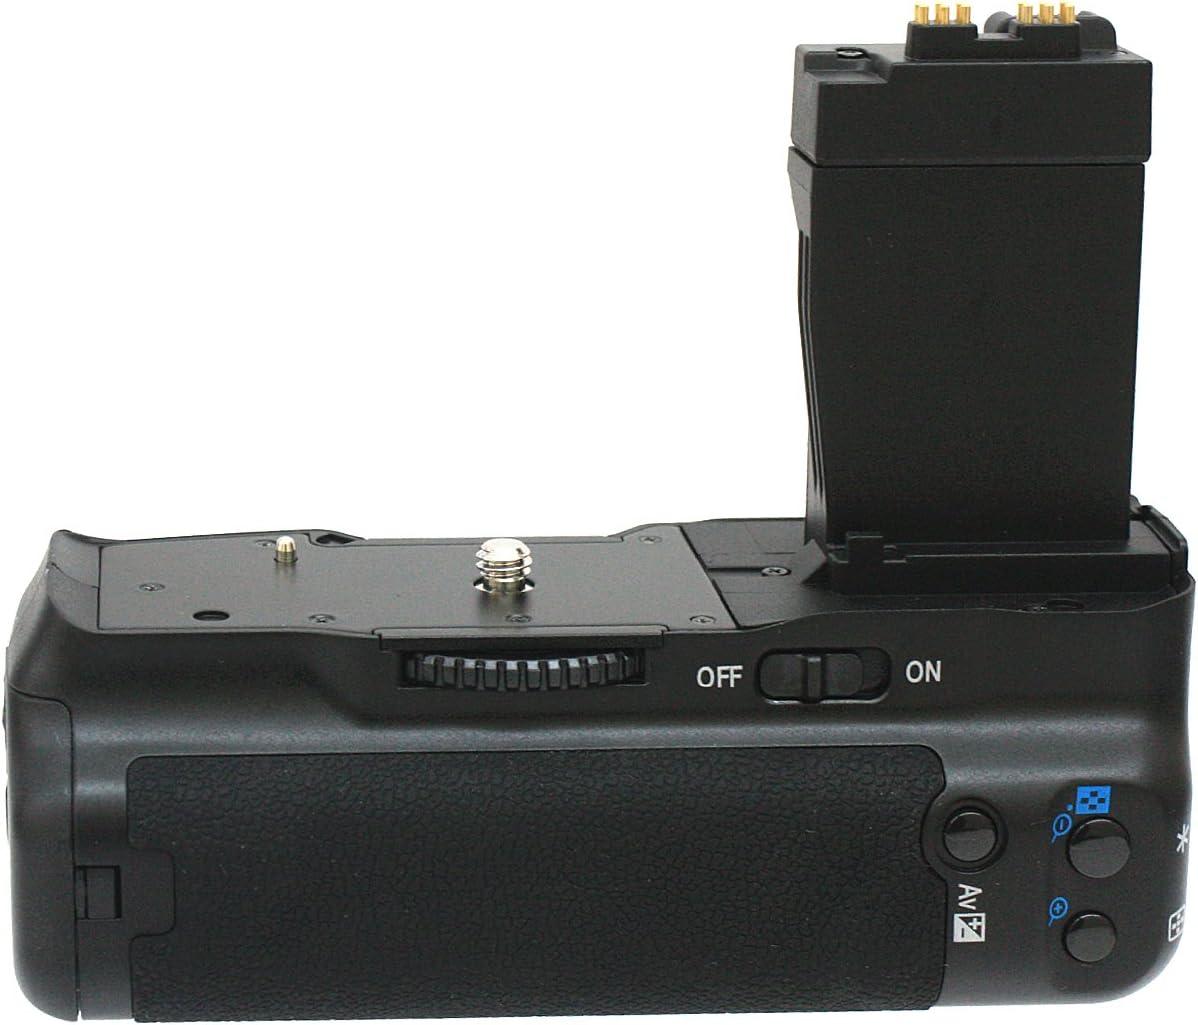 Xit XTNG7100 Battery Grip for Nikon D7100 Black MB-D15